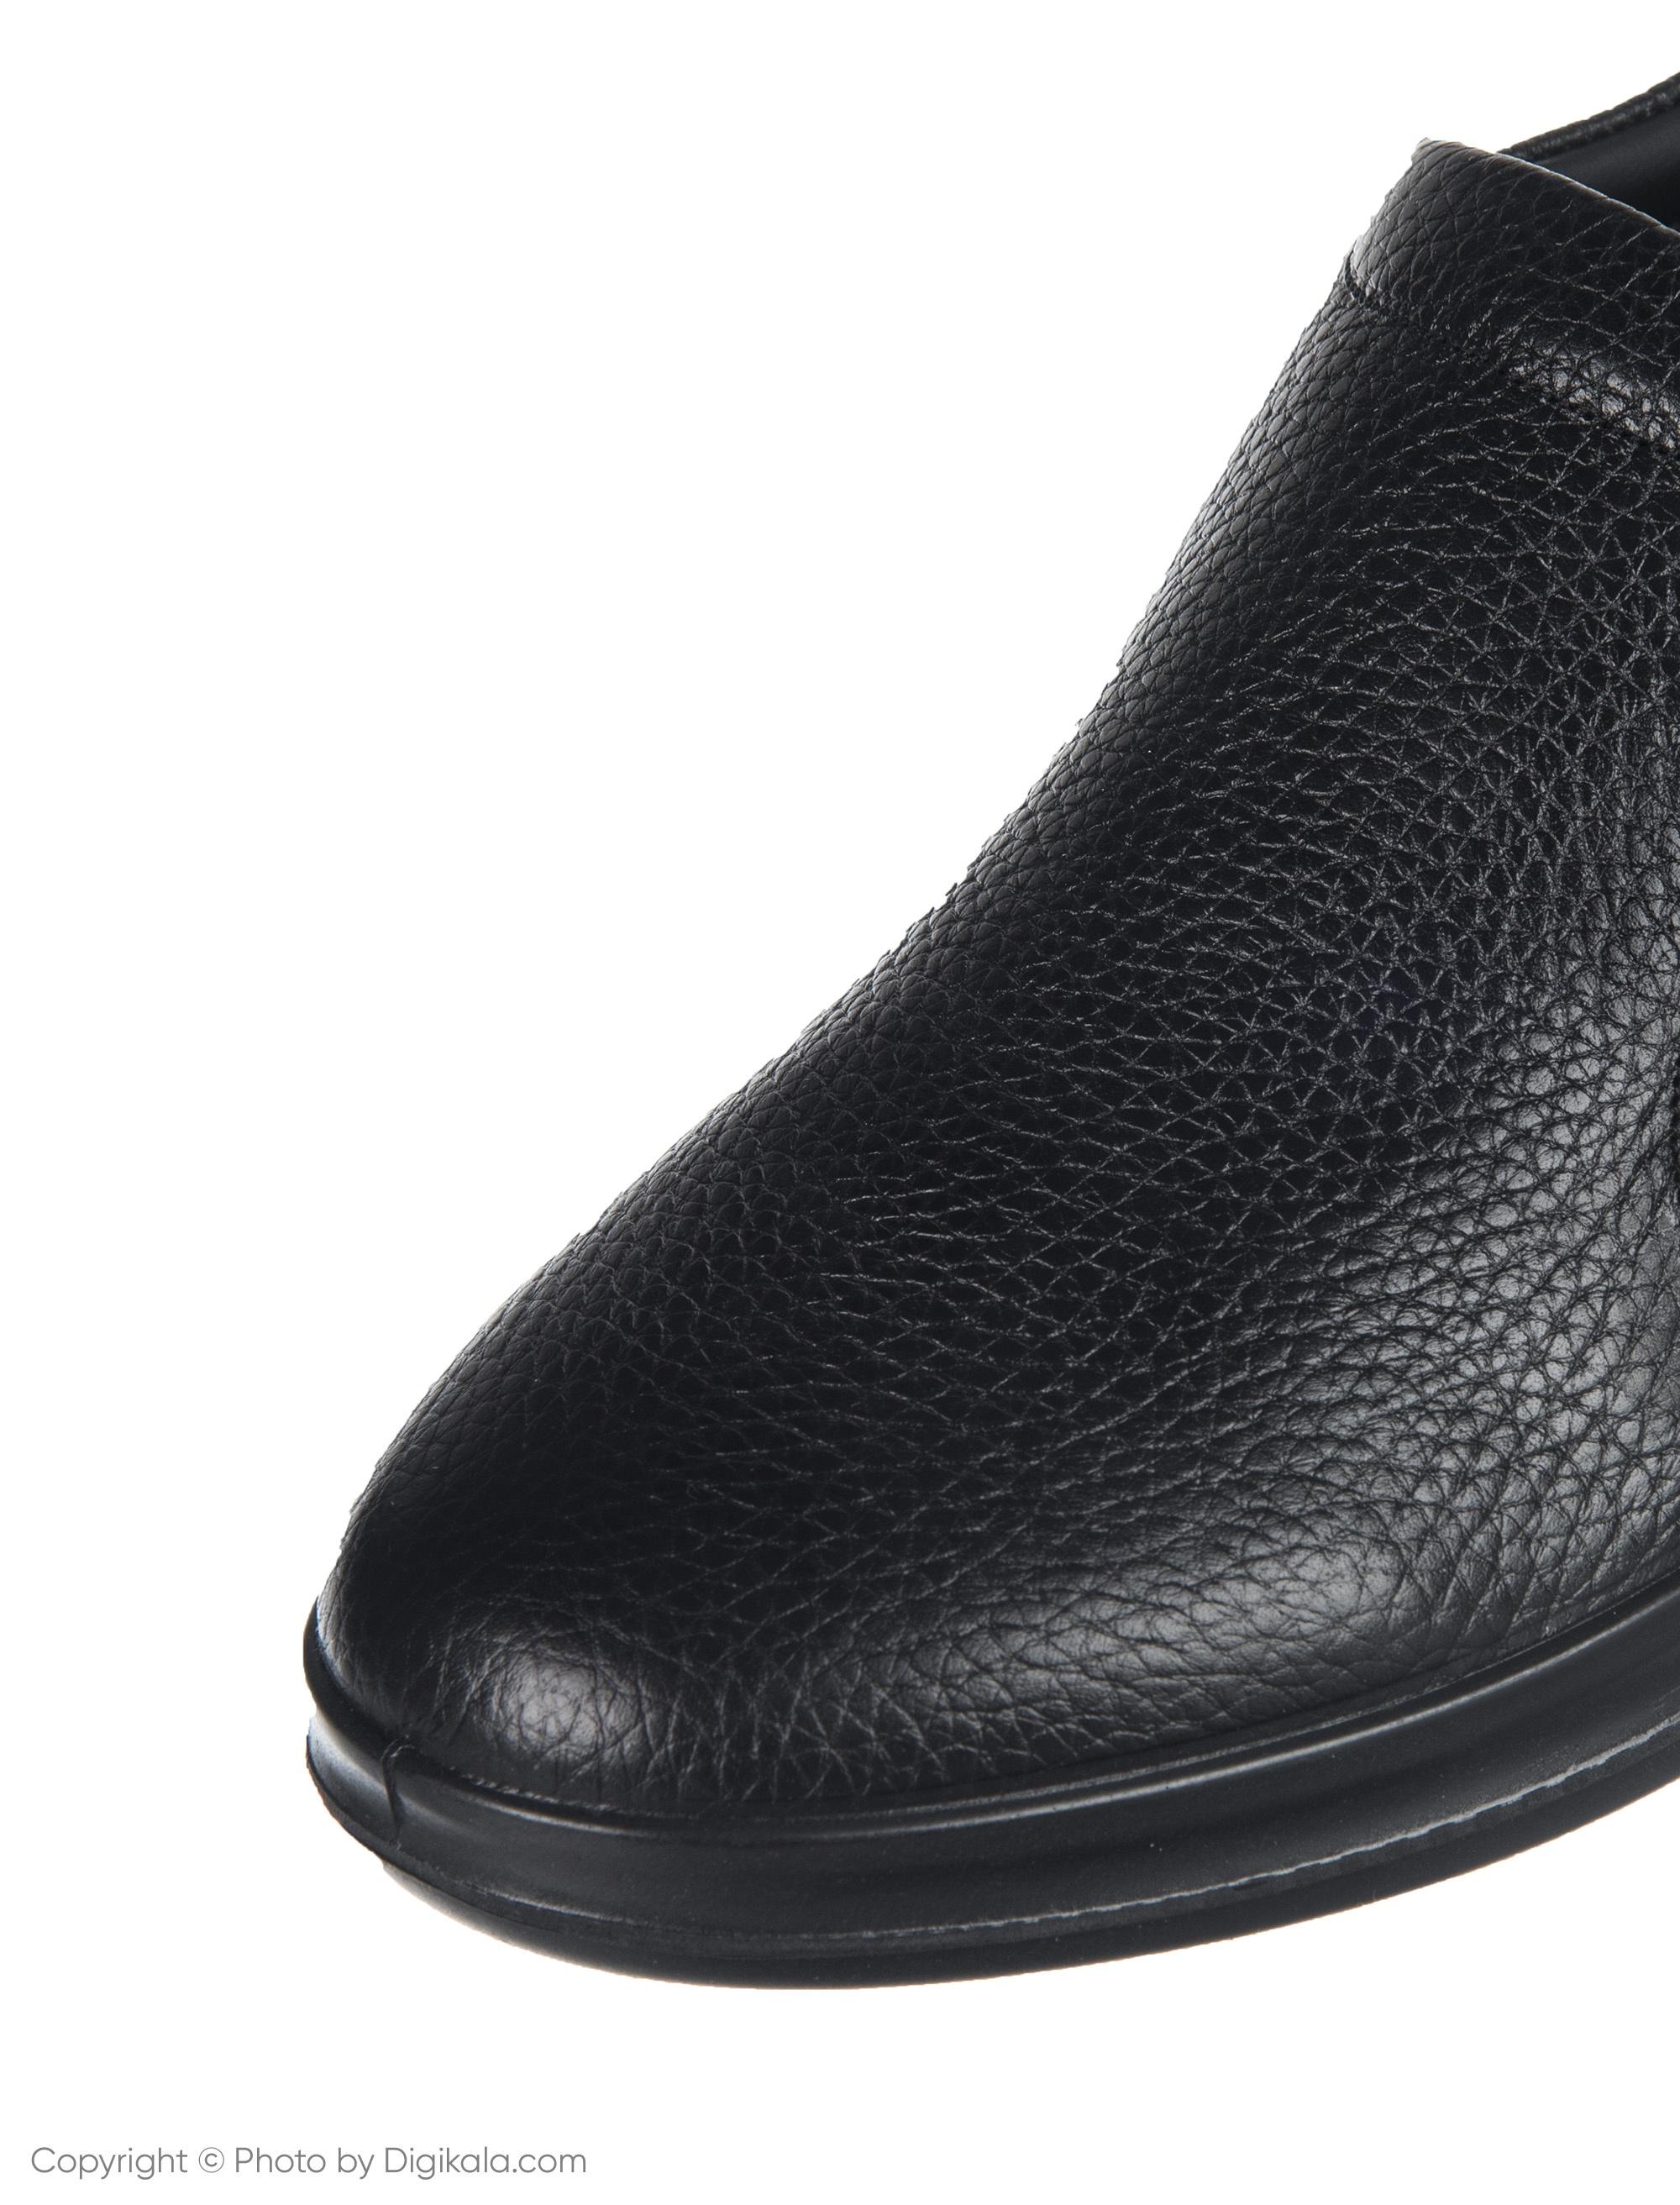 کفش مردانه دنیلی مدل 113110241002 -  - 6